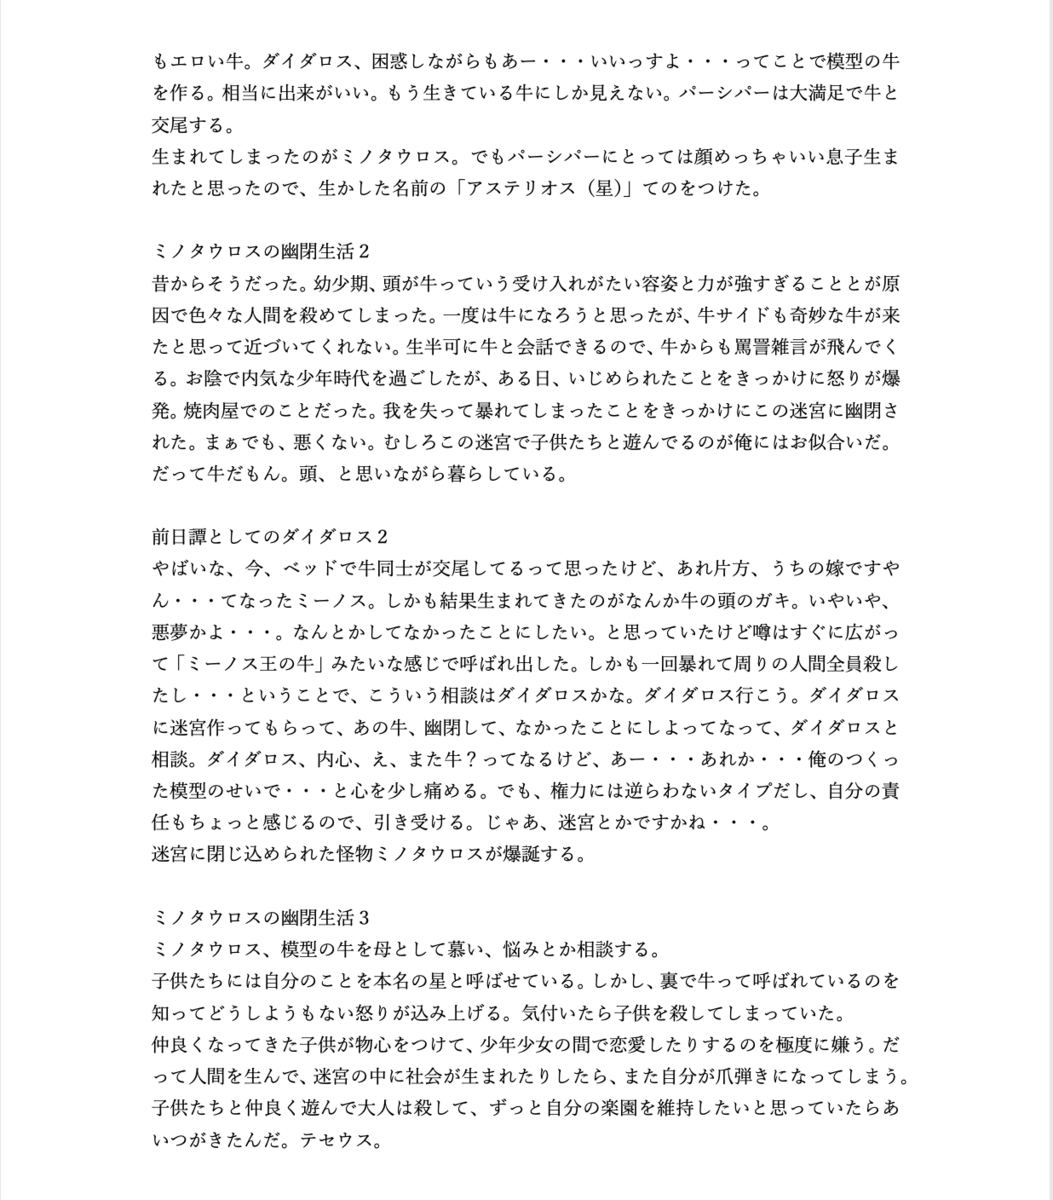 f:id:mawaruazarashi:20210308221527p:plain